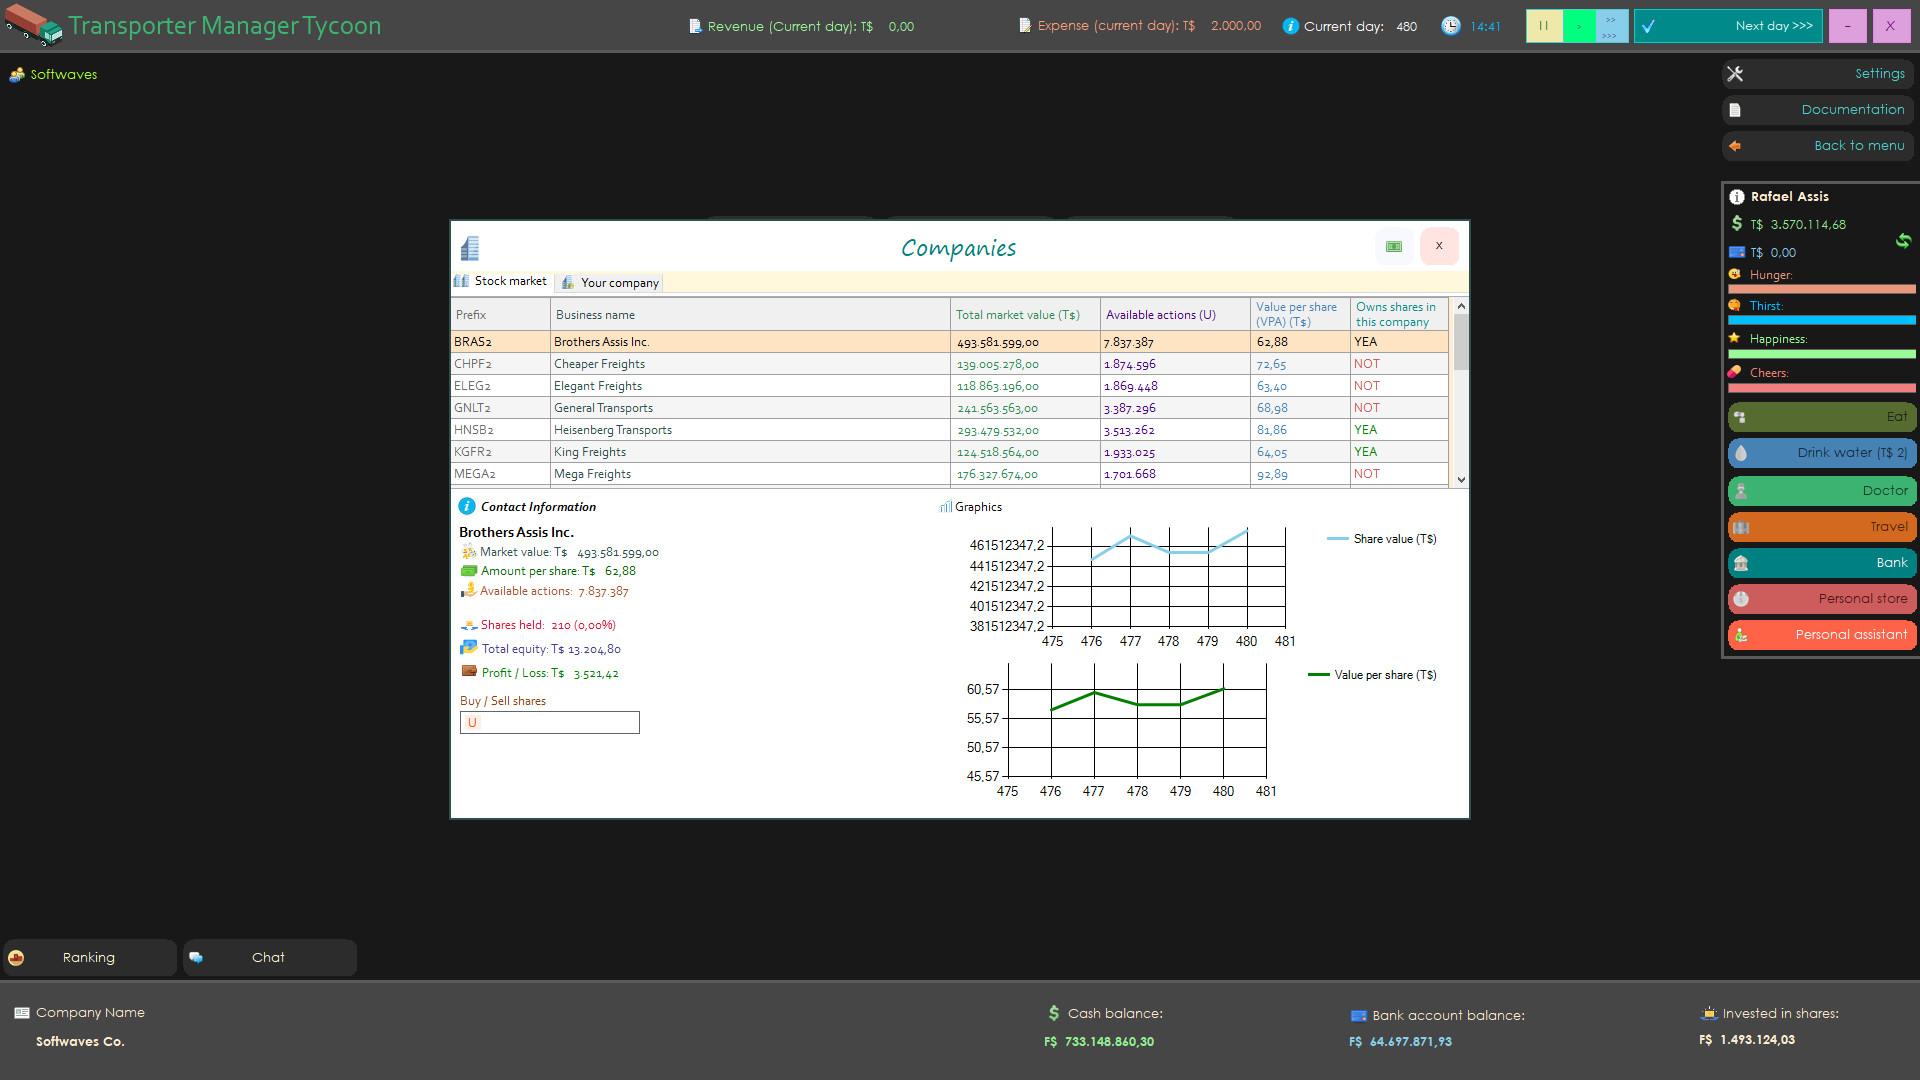 Transporter Manager Tycoon screenshot